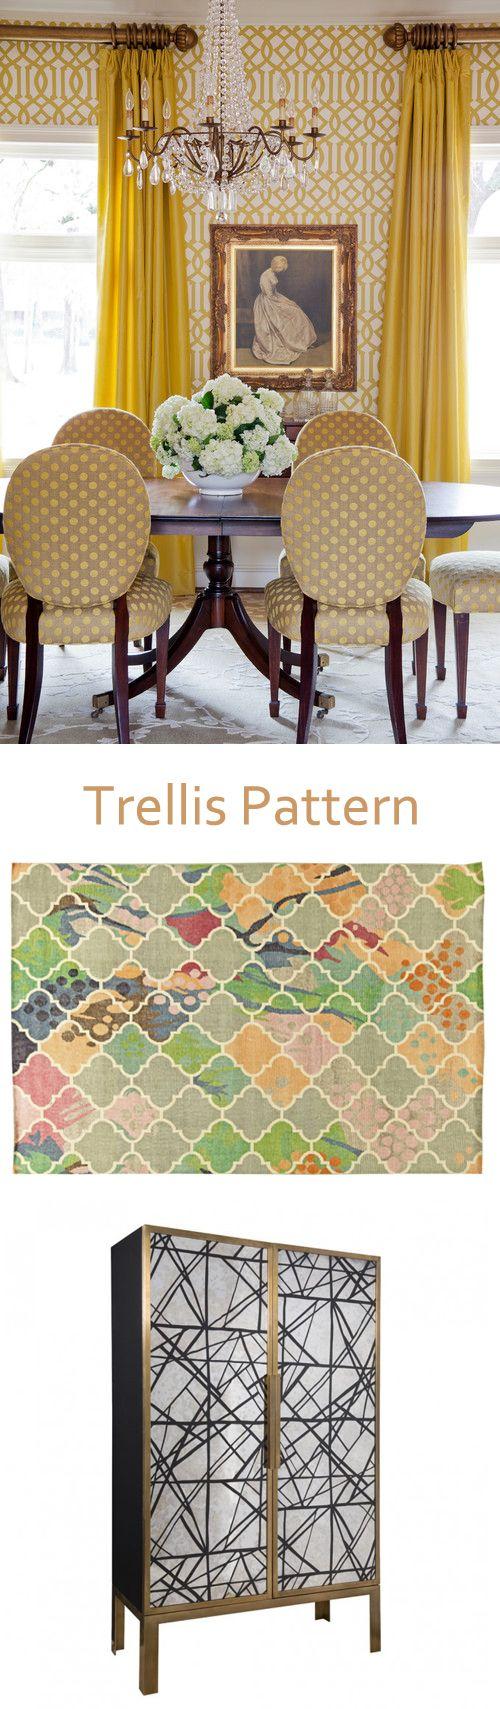 The Venerable Trellis Pattern at home